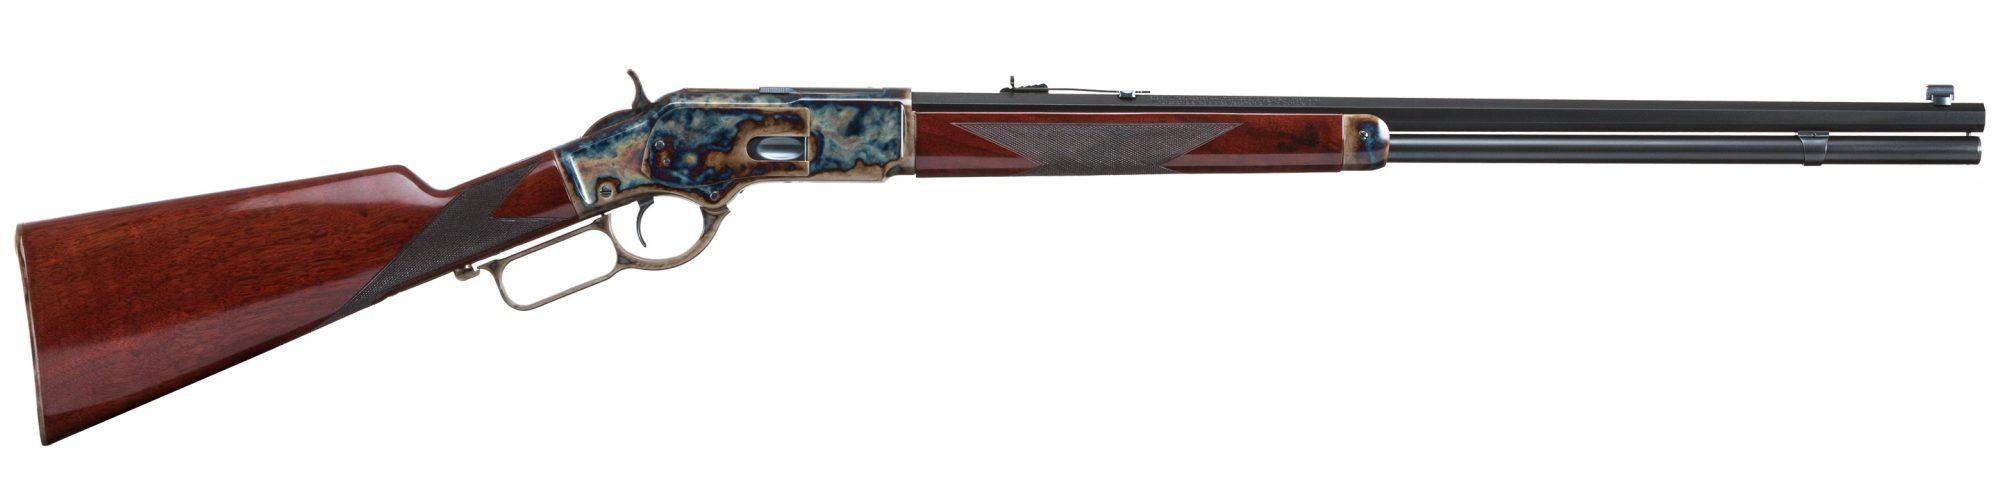 6307 Turnbull Winchester 1873 44 00118ZT73Y